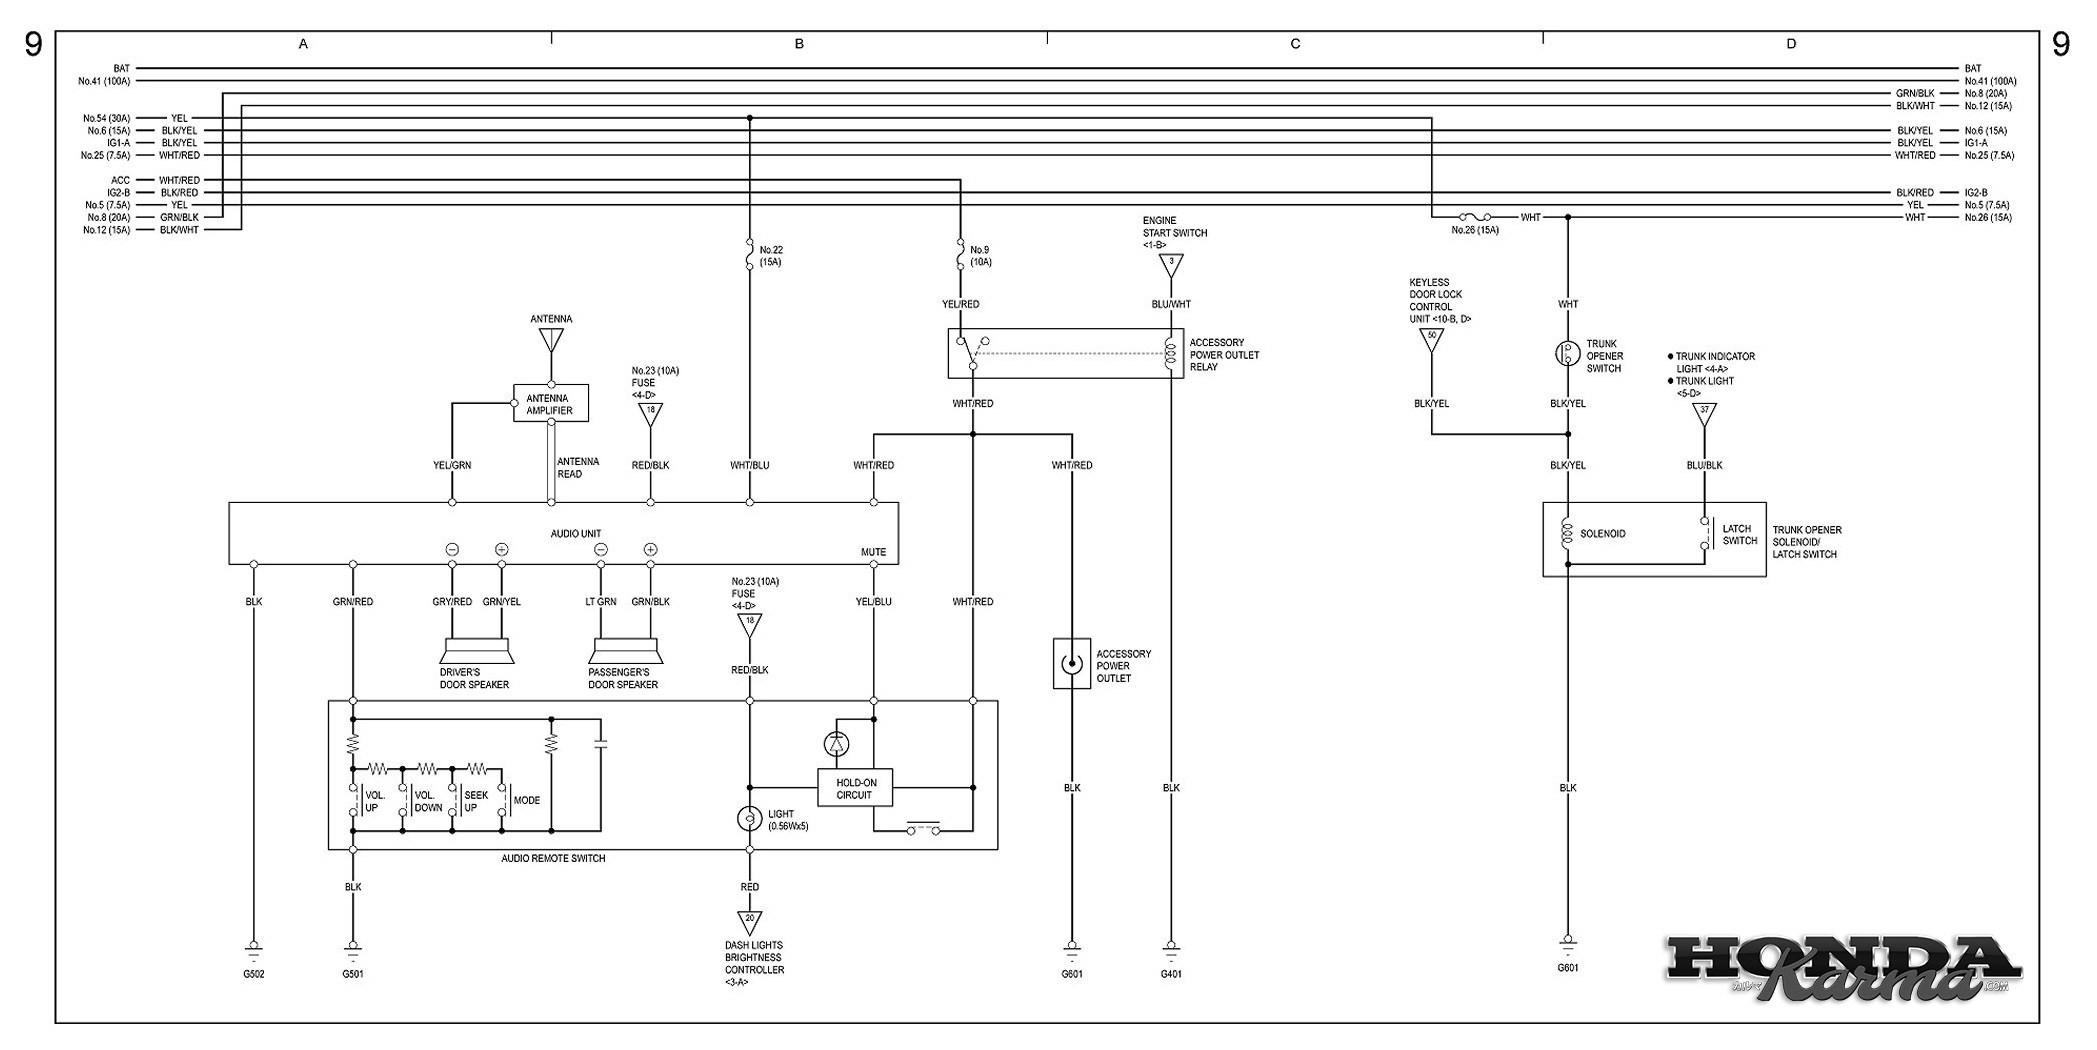 gentex 313 wiring diagram unique gentex 177 wiring diagram hyundai ballast wiring diagram rear view of gentex 313 wiring diagram